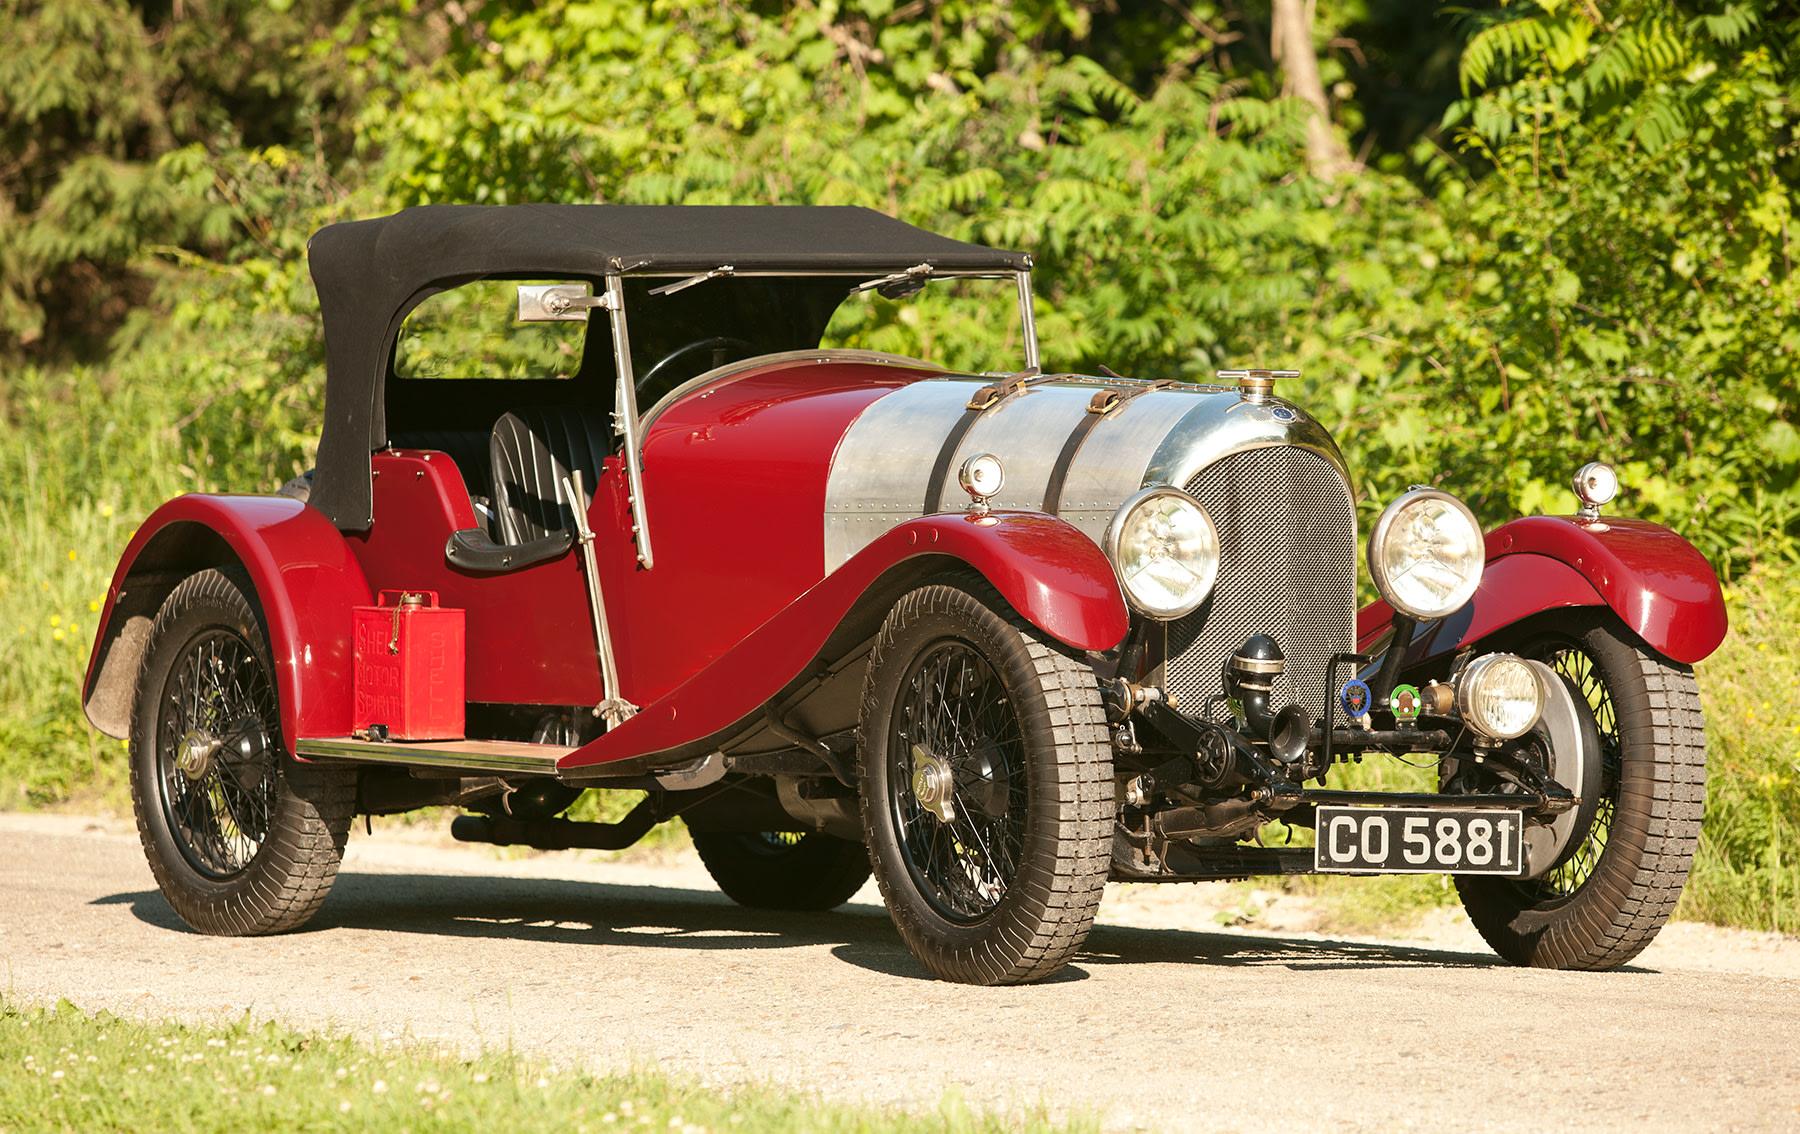 1923 Bentley TT Replica Three Litre Tourer